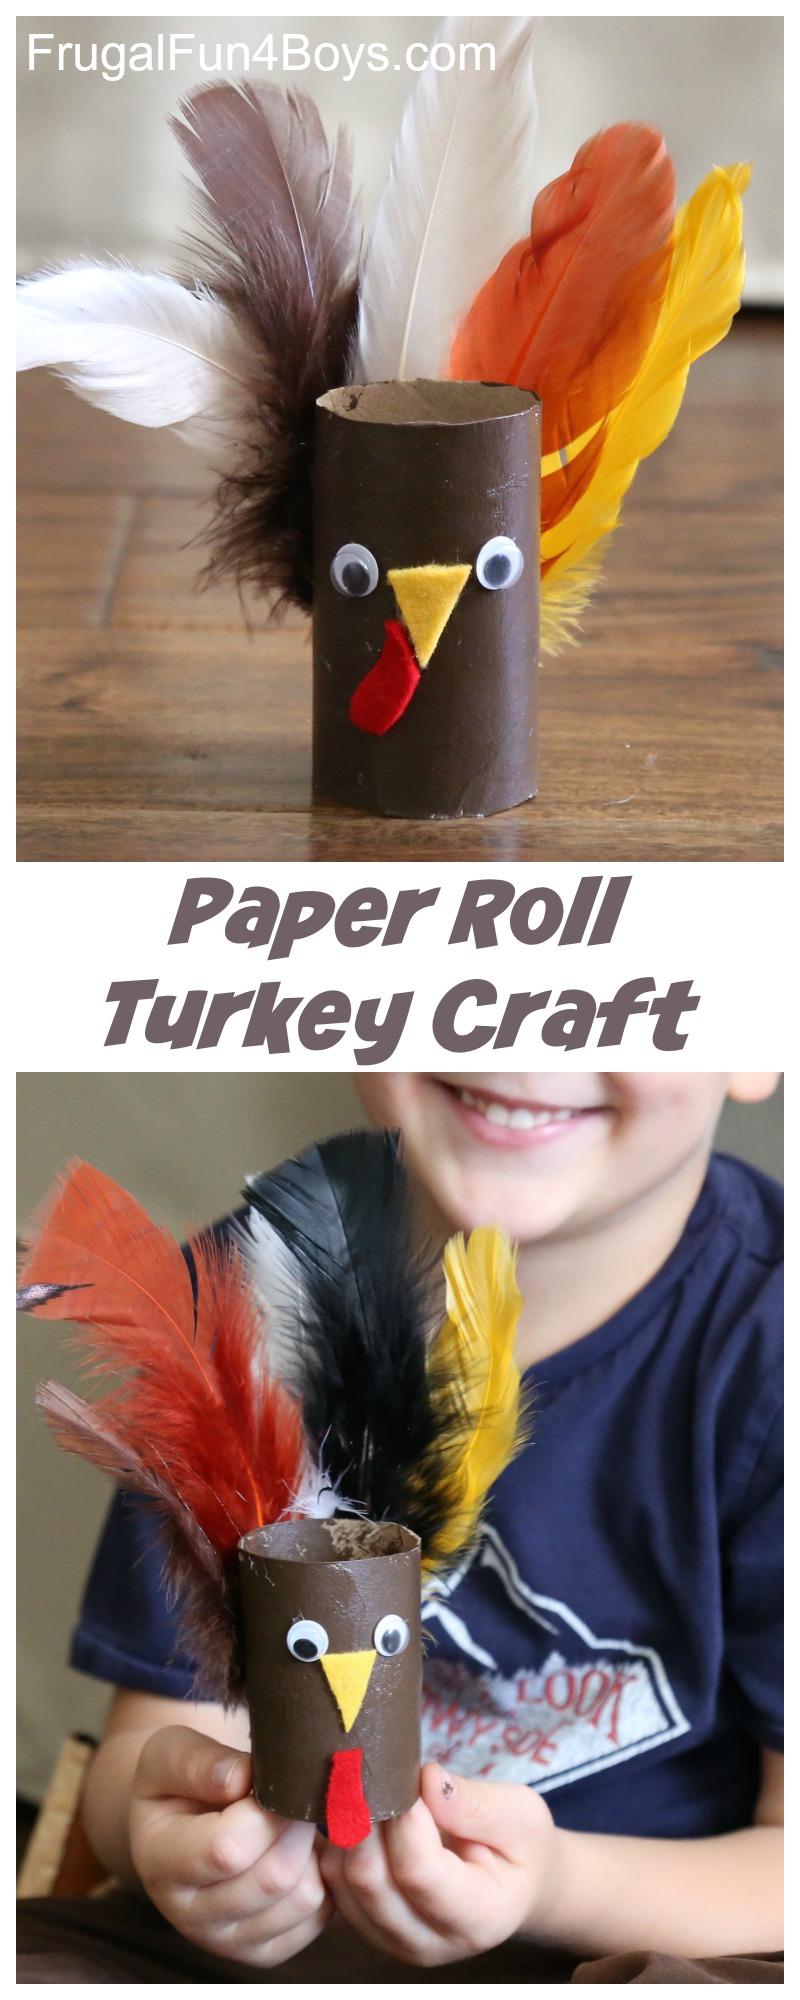 Paper Roll Turkey Craft for Kids